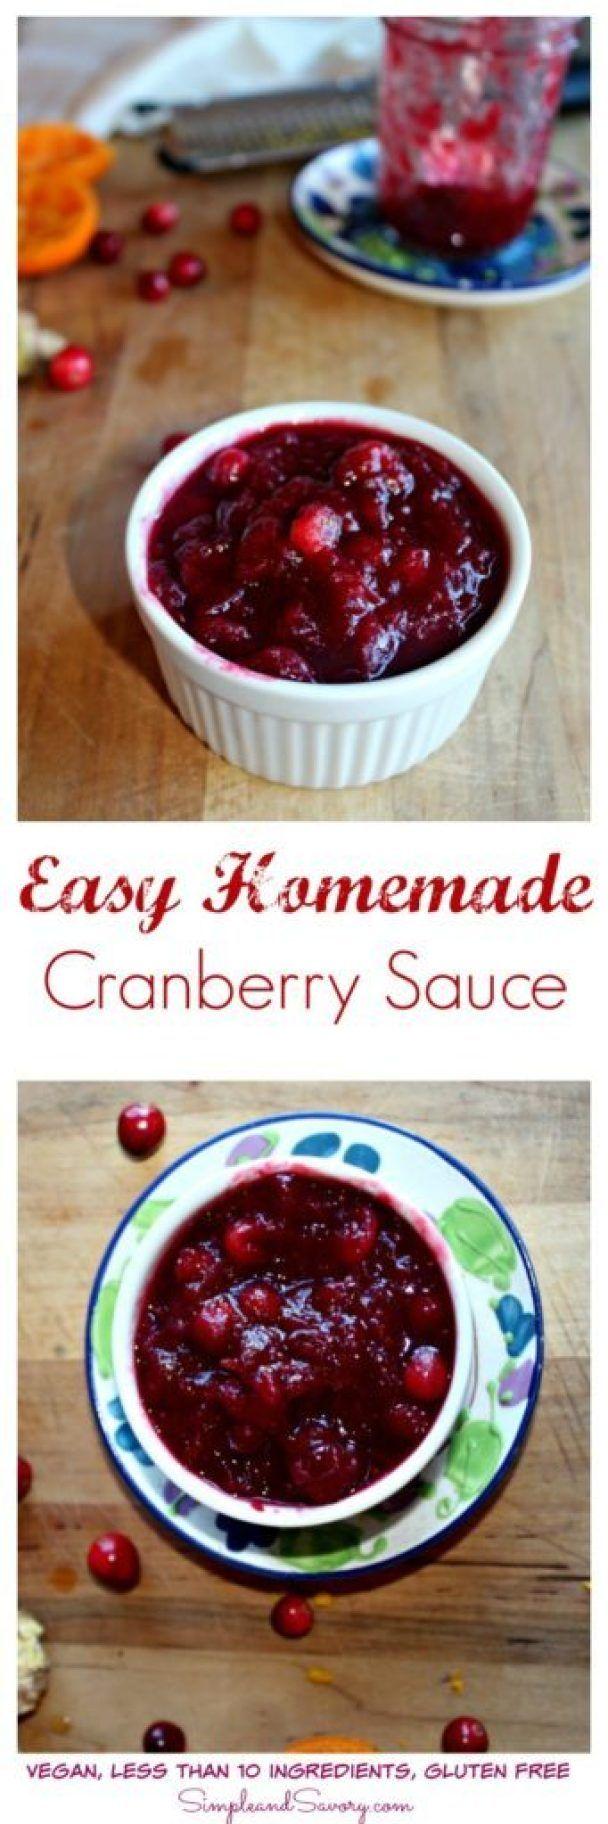 Homemade Cranberry Sauce Recipe Cranberry sauce